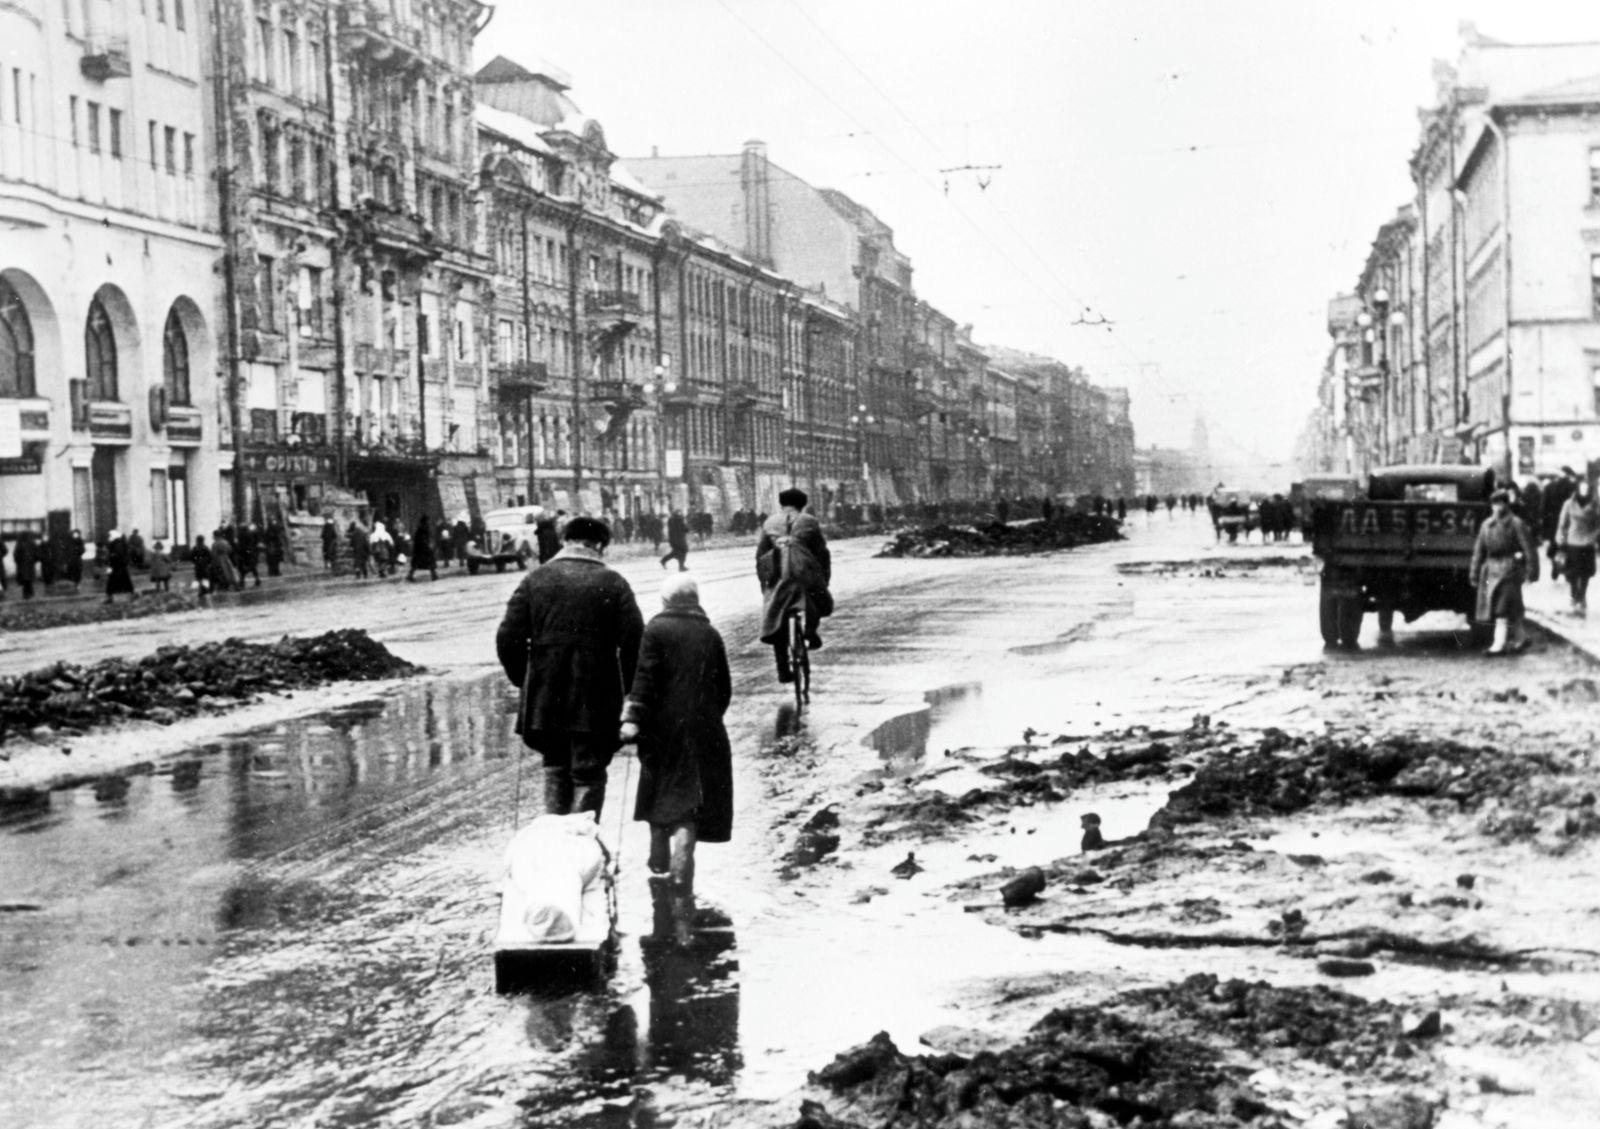 world war ll: taking a dead family member to the cemetery along nevsky prospect in leningrad during the blockade, 1942.